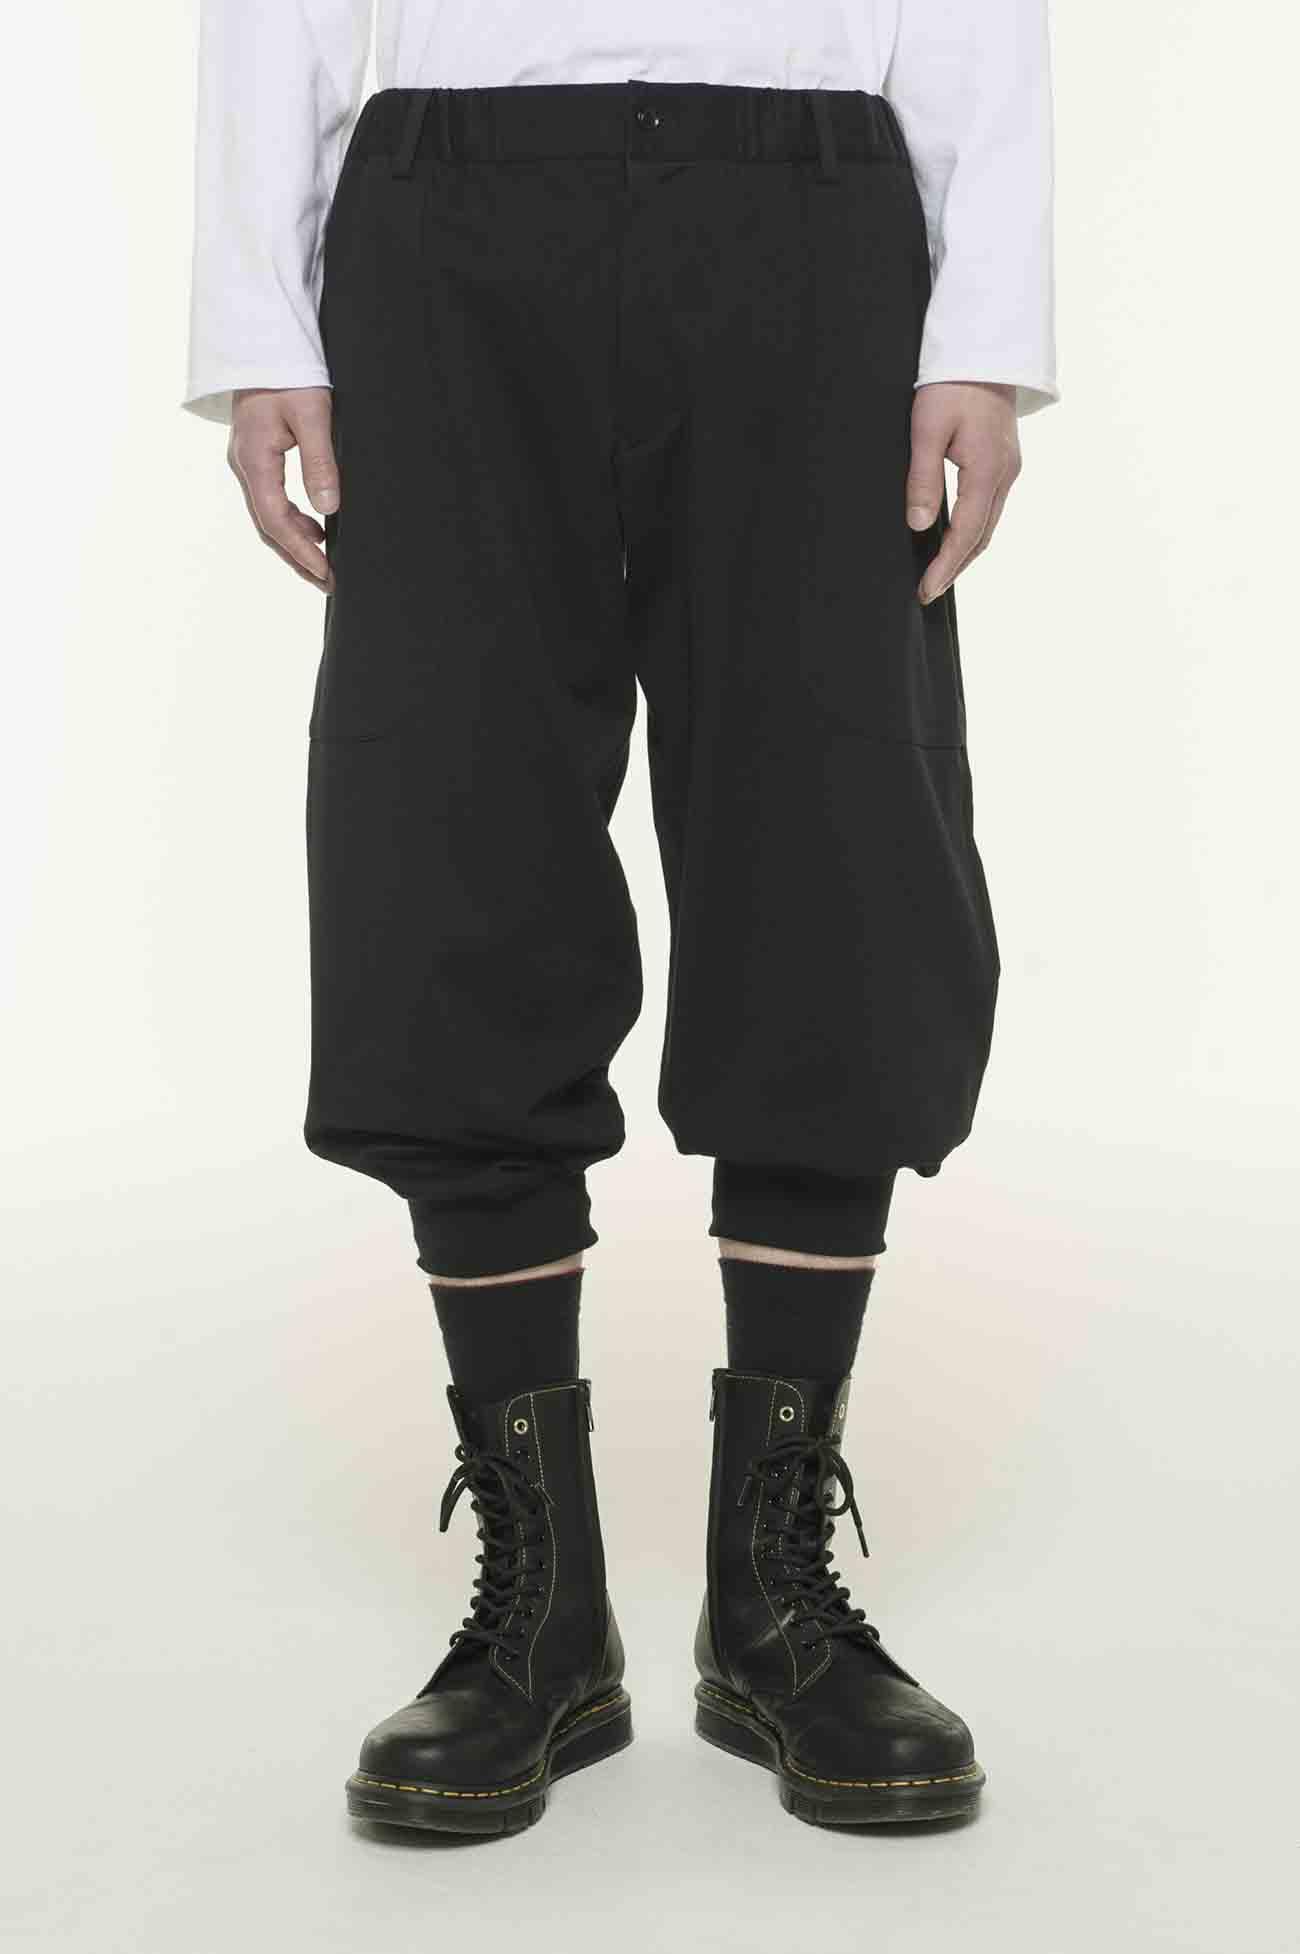 40/2 Cotton Jersey Cropped Ribu Length Free Pants